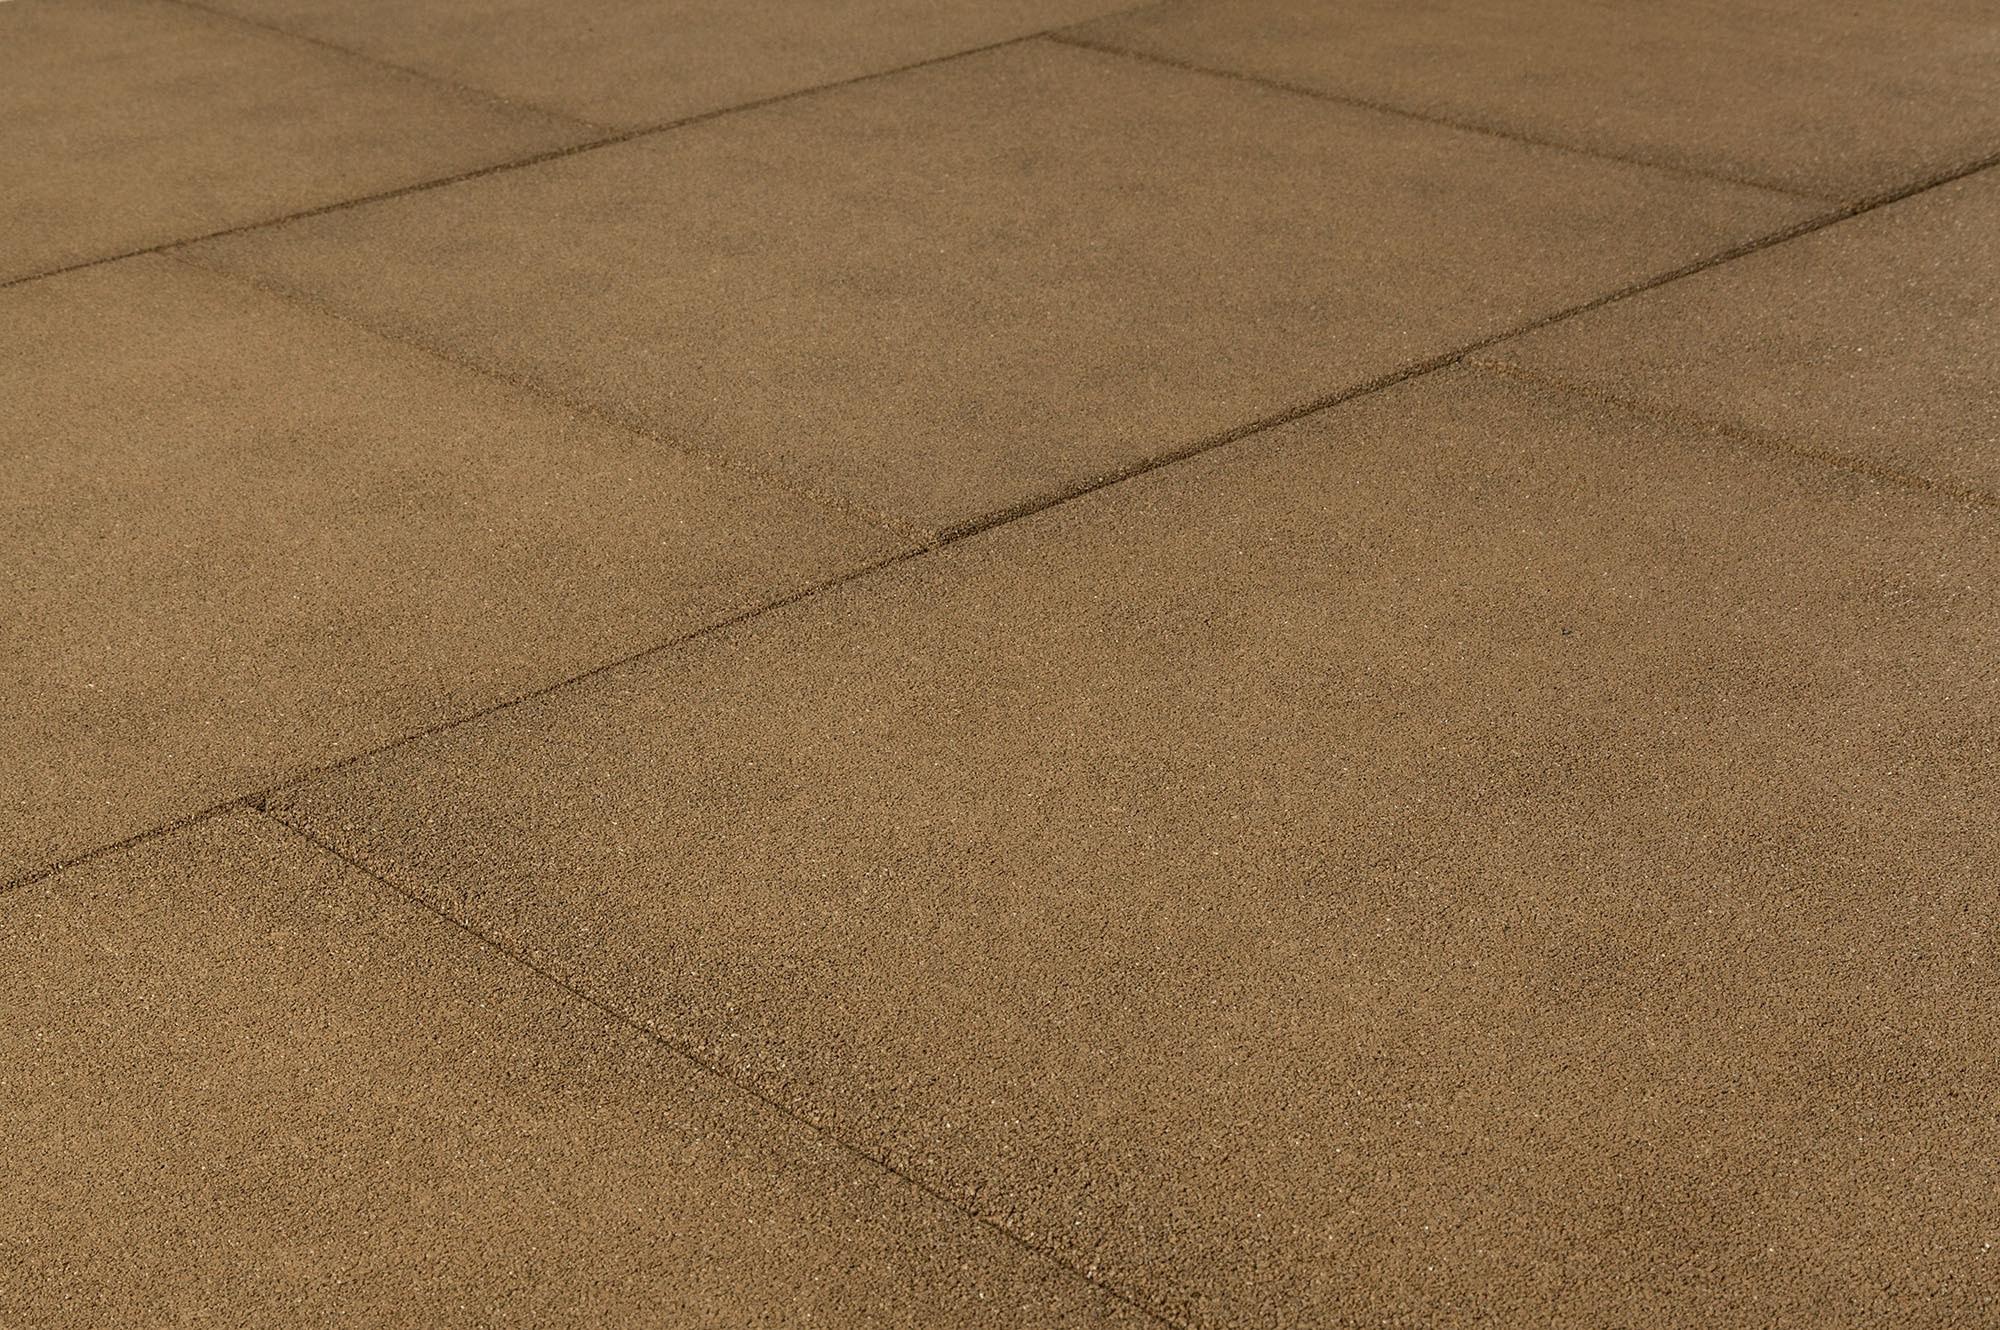 Backyard Rubber Tiles : Brava Outdoor Prestige Rubber Tiles Pigment Stone Beige24x24x2 1